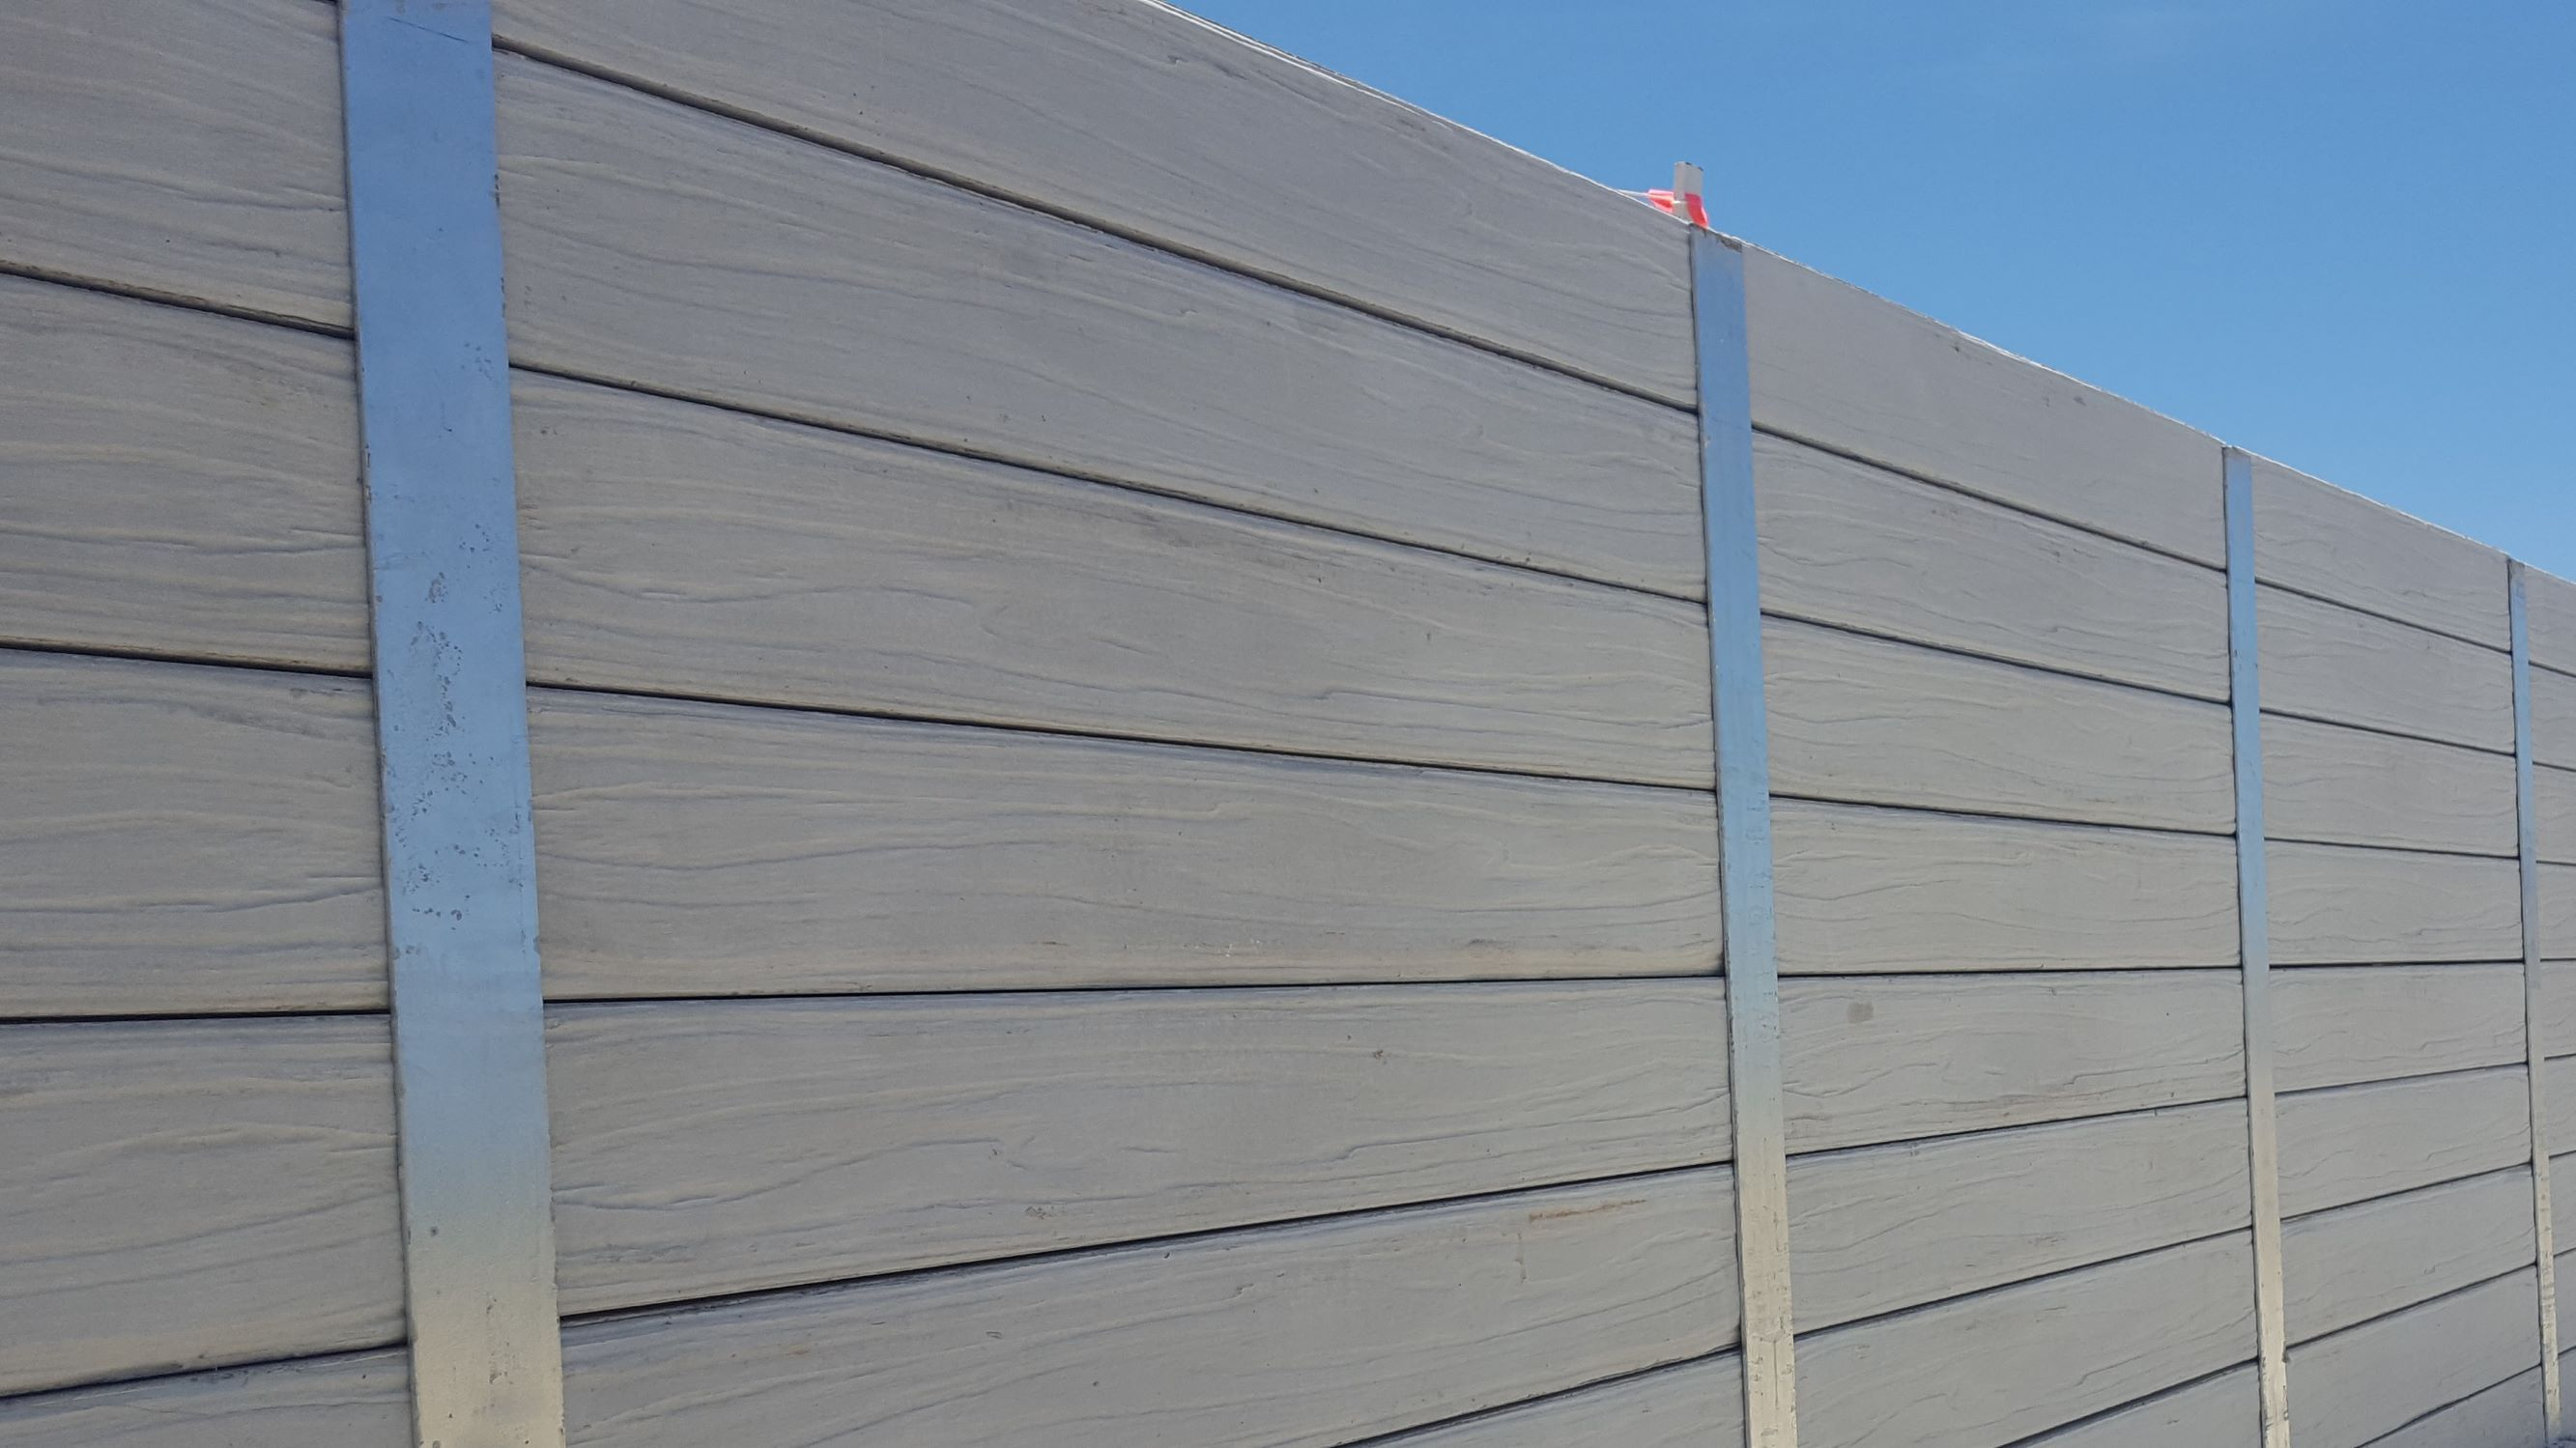 Concrete Sleeper Retaining Walls Concrete Sleeper Retaining Walls Concrete Sleepers Retaining Wall